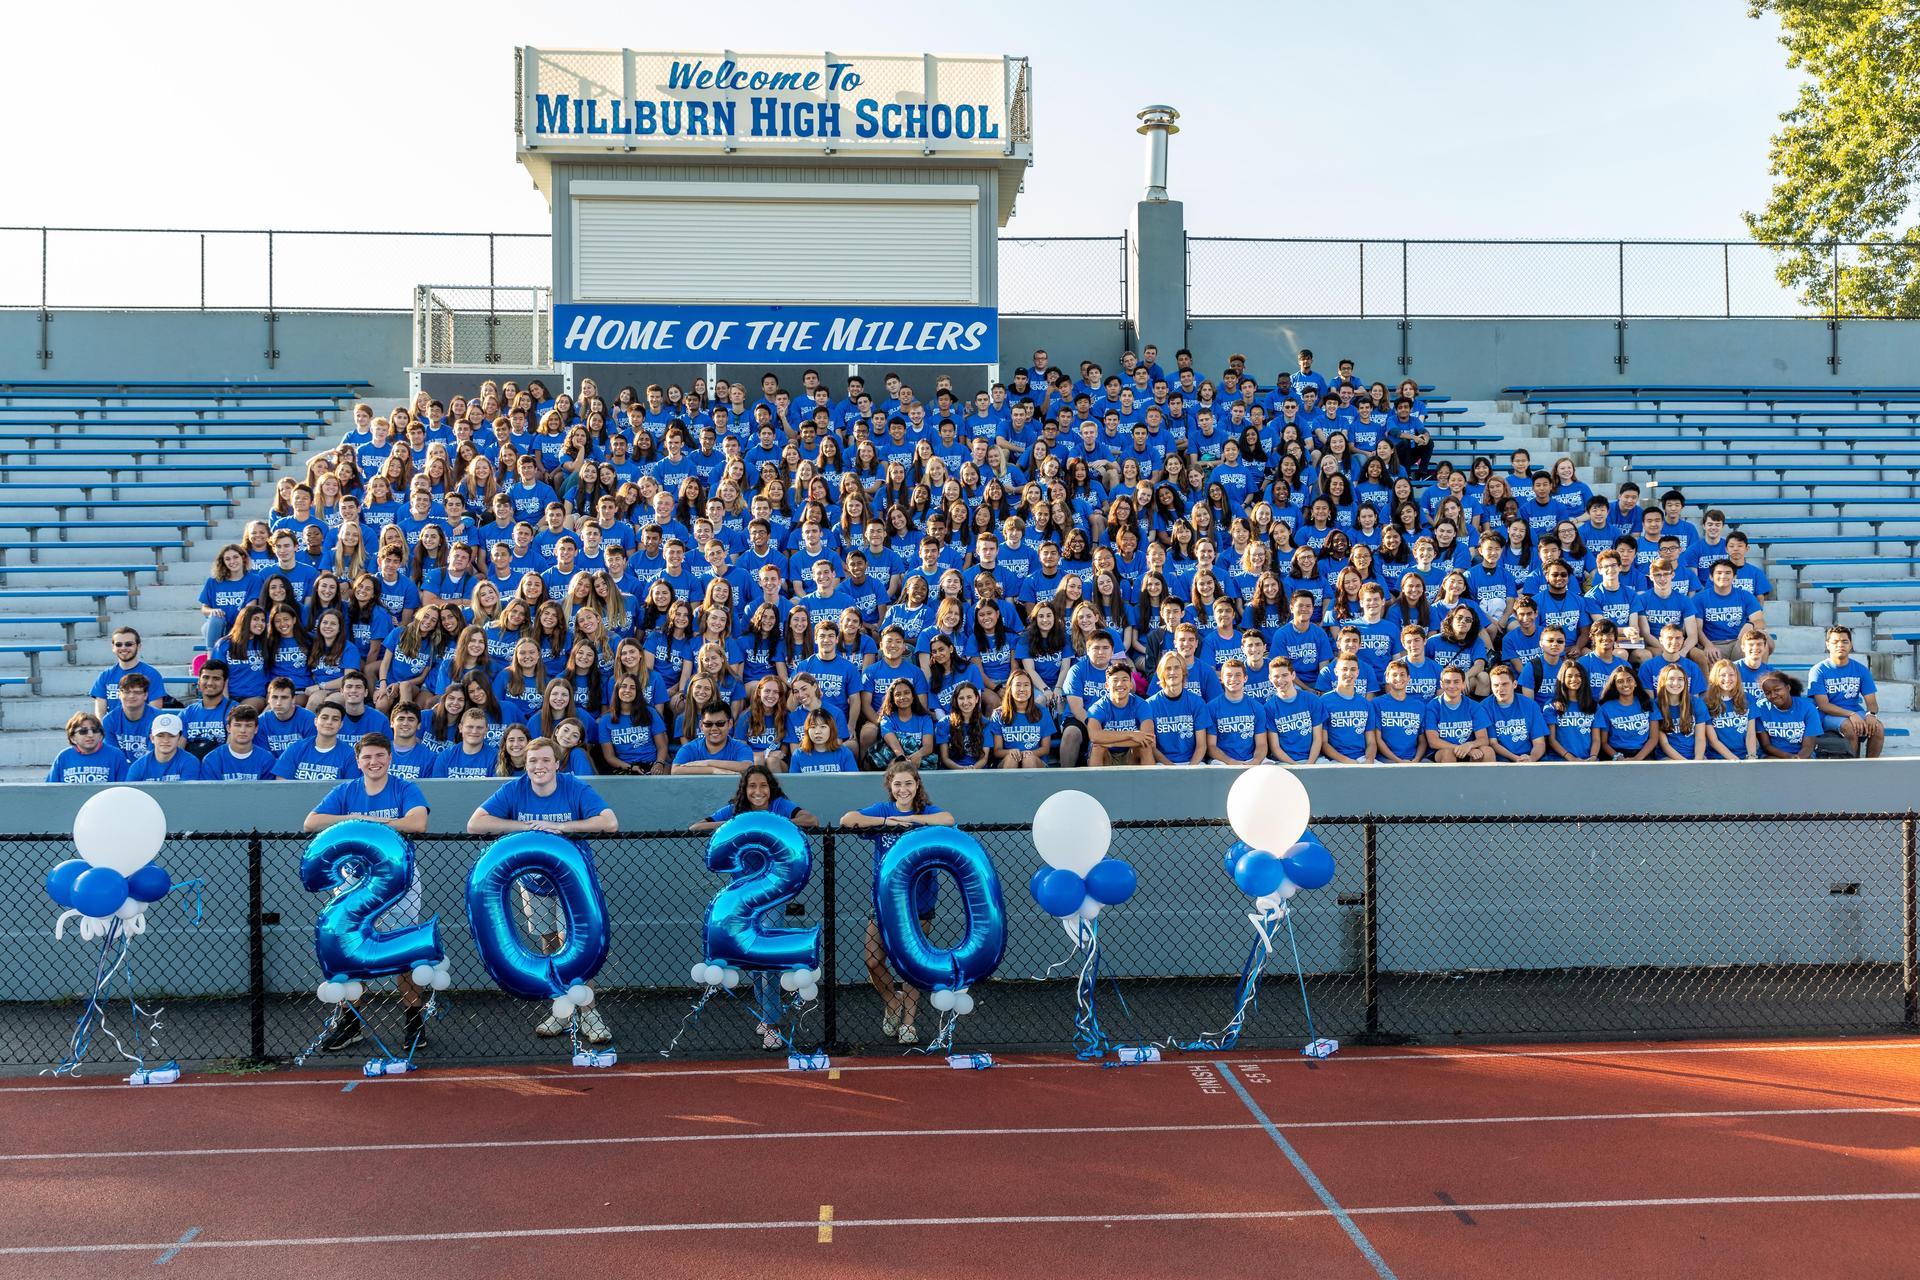 Millburn High School Class of 2020